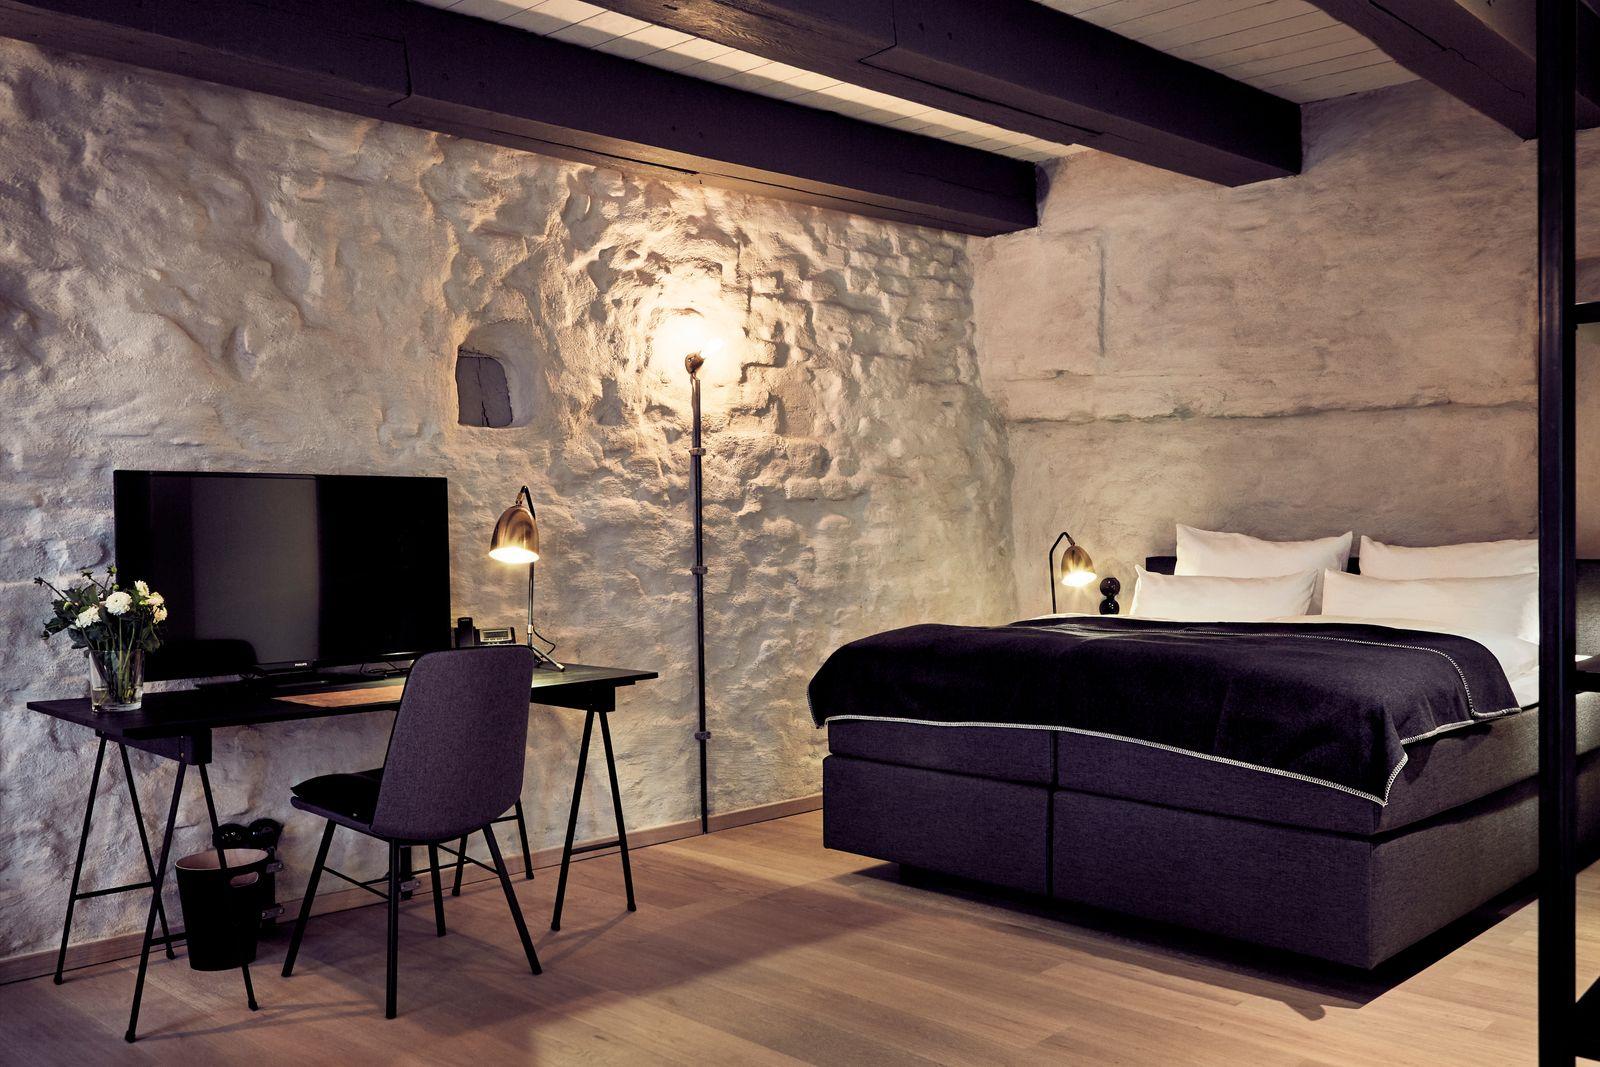 Fishers Loft Hotel / Zimmer